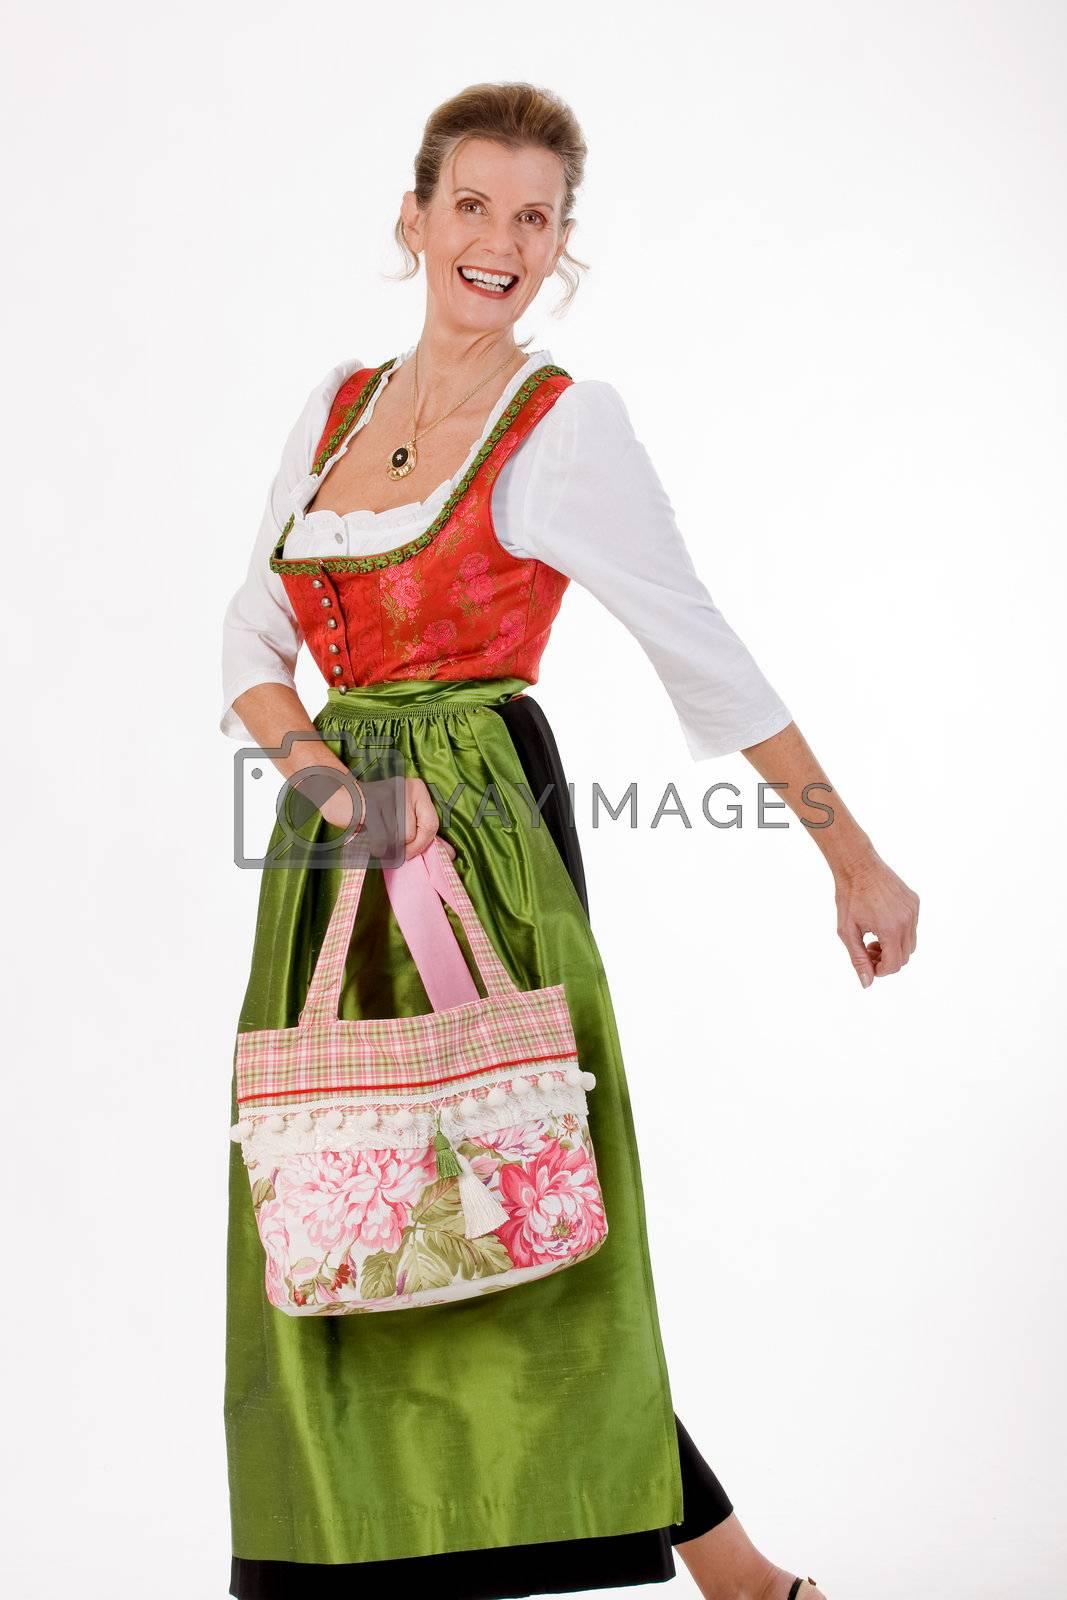 Elan full Bavarian costume elderly lady in dress and fashionable shopping bag